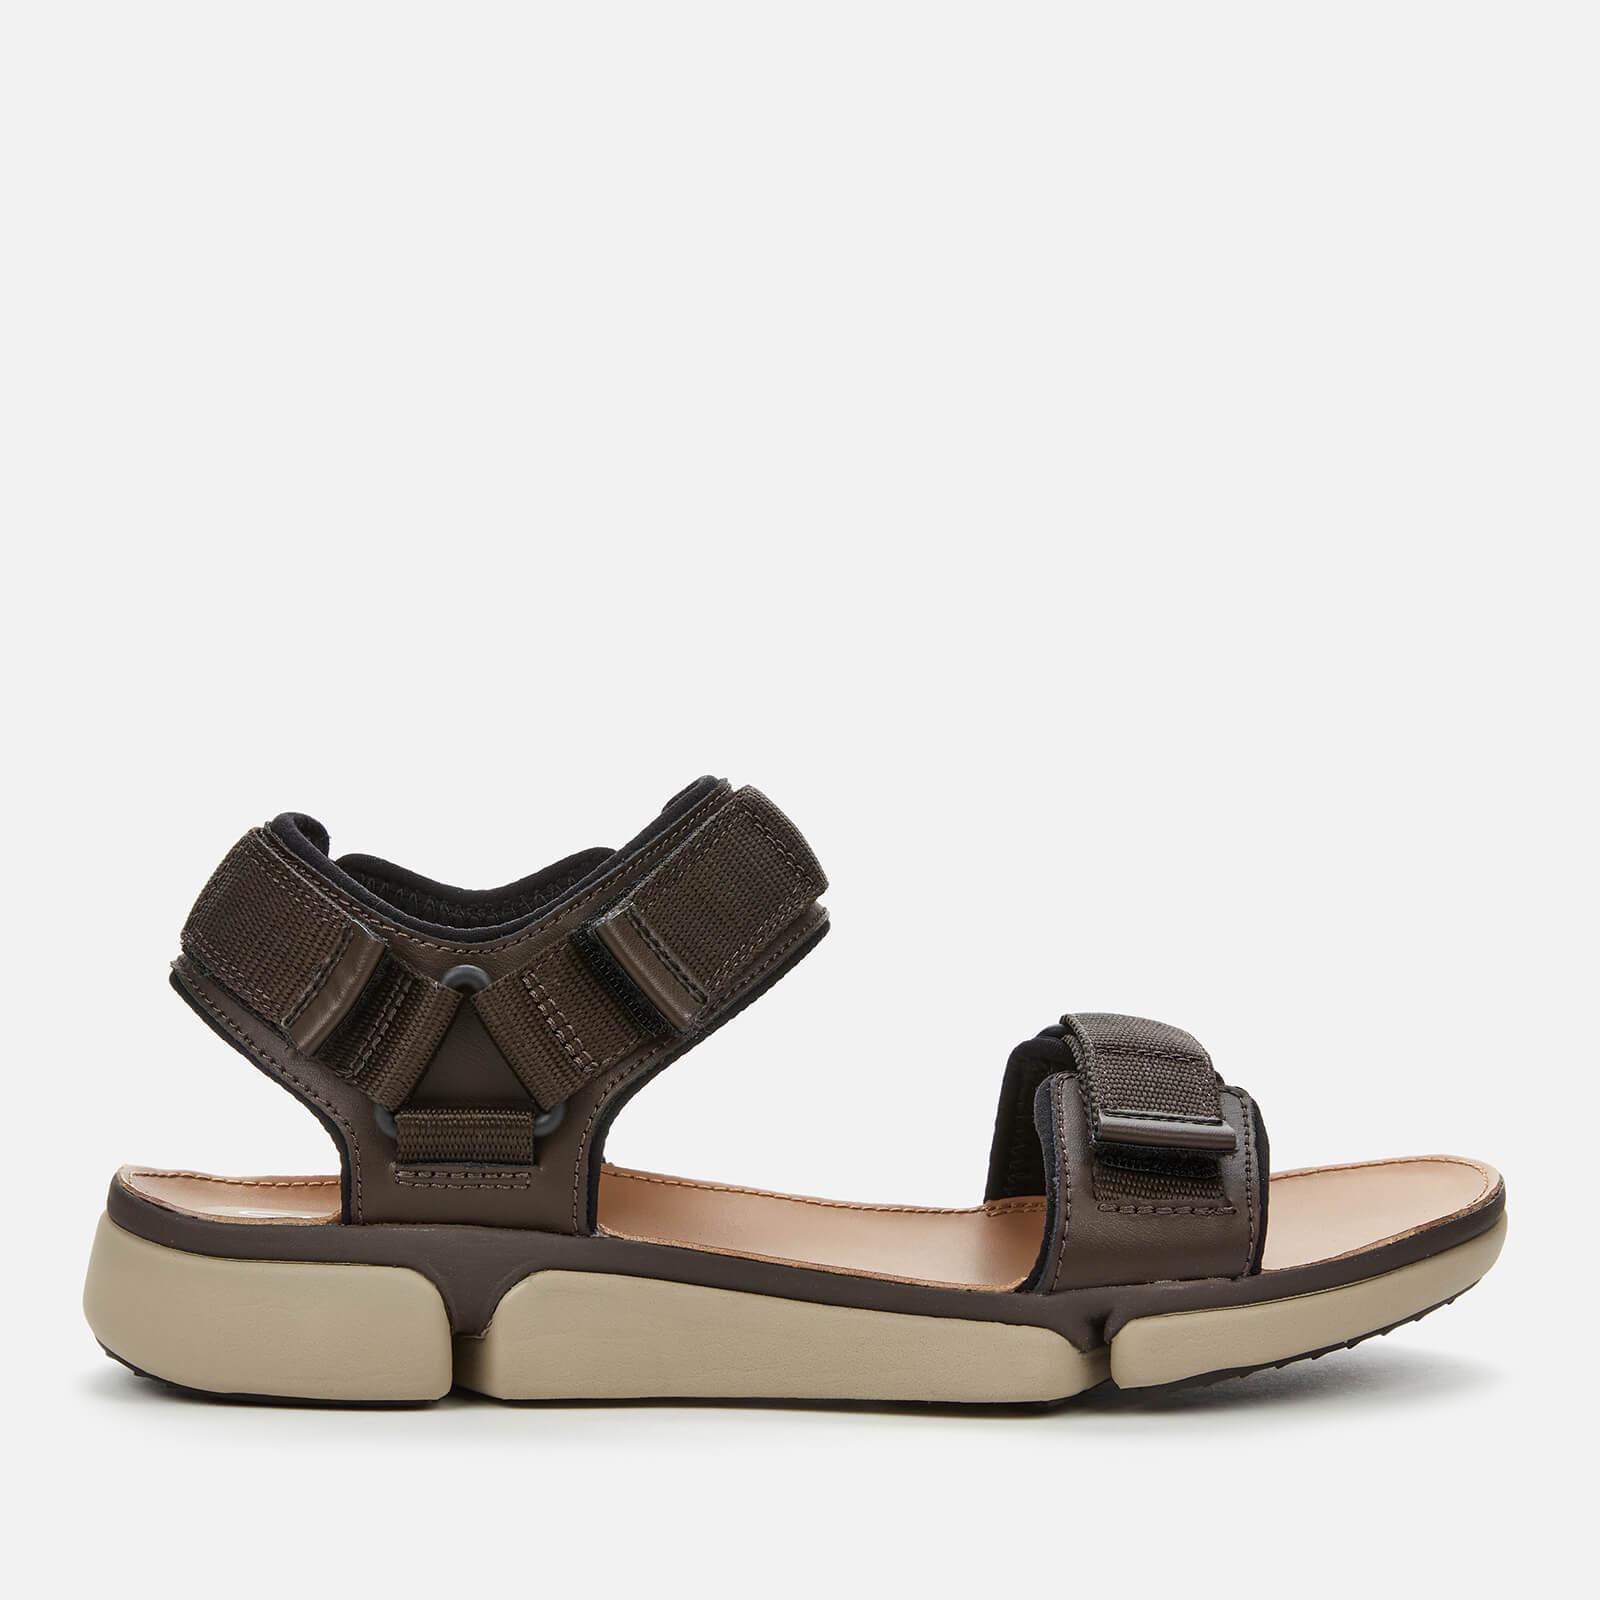 Clarks Men's Tri Cove Trail Outdoor Sandals - Dark Brown Combi - UK 9